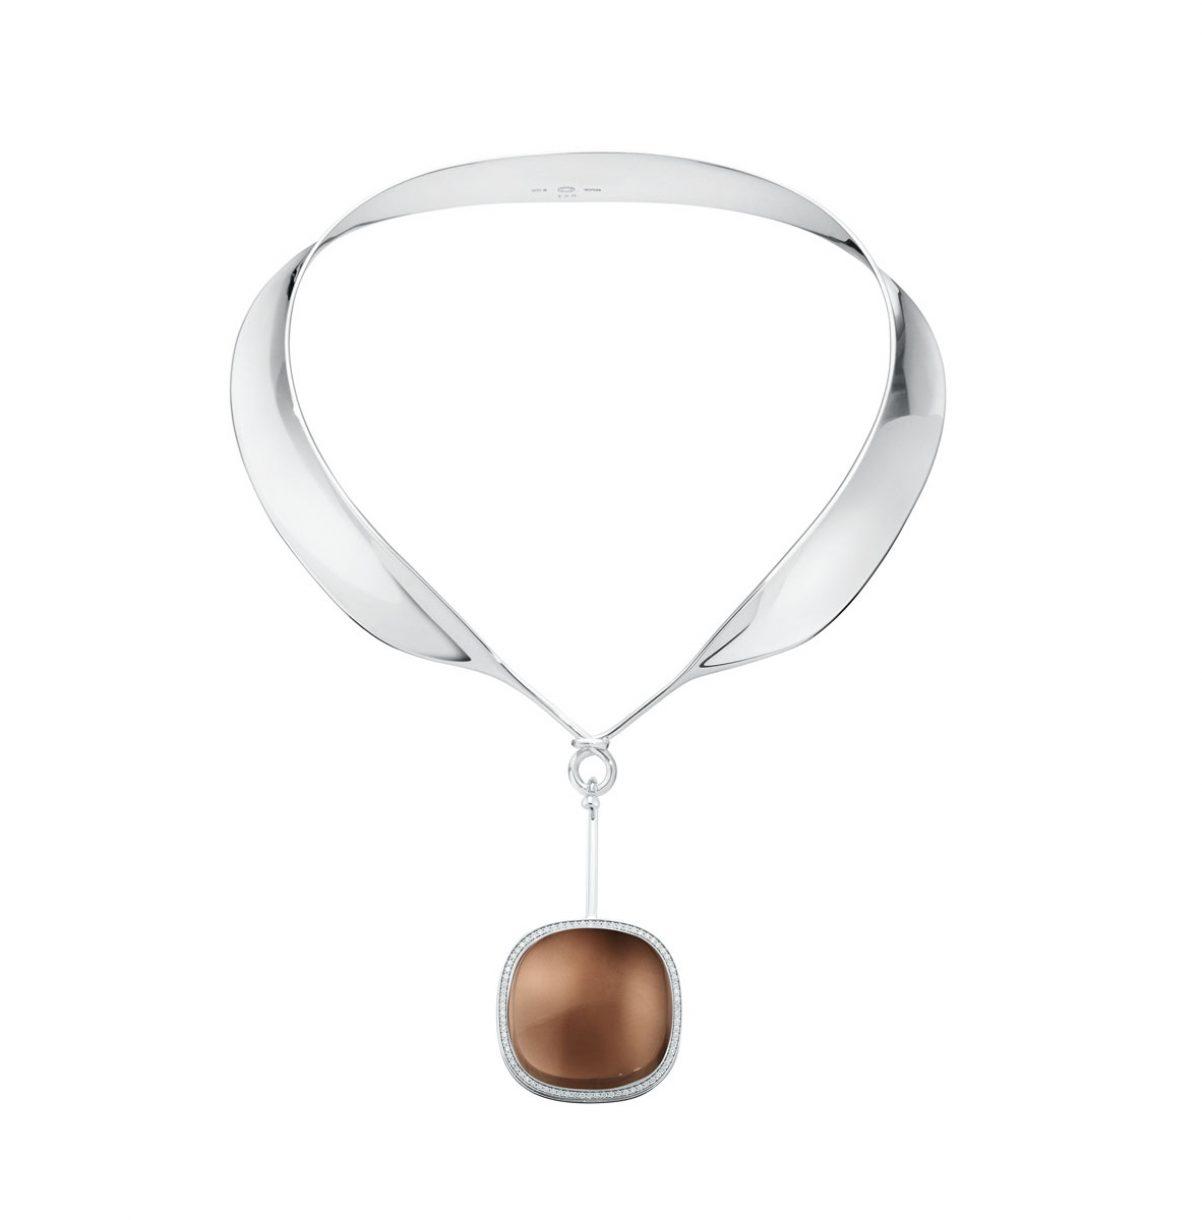 GEORG JENSEN VIVIANNA DEW DROP純銀煙水晶與鑽石墜飾頸圈,參考售價NTD 135,500。